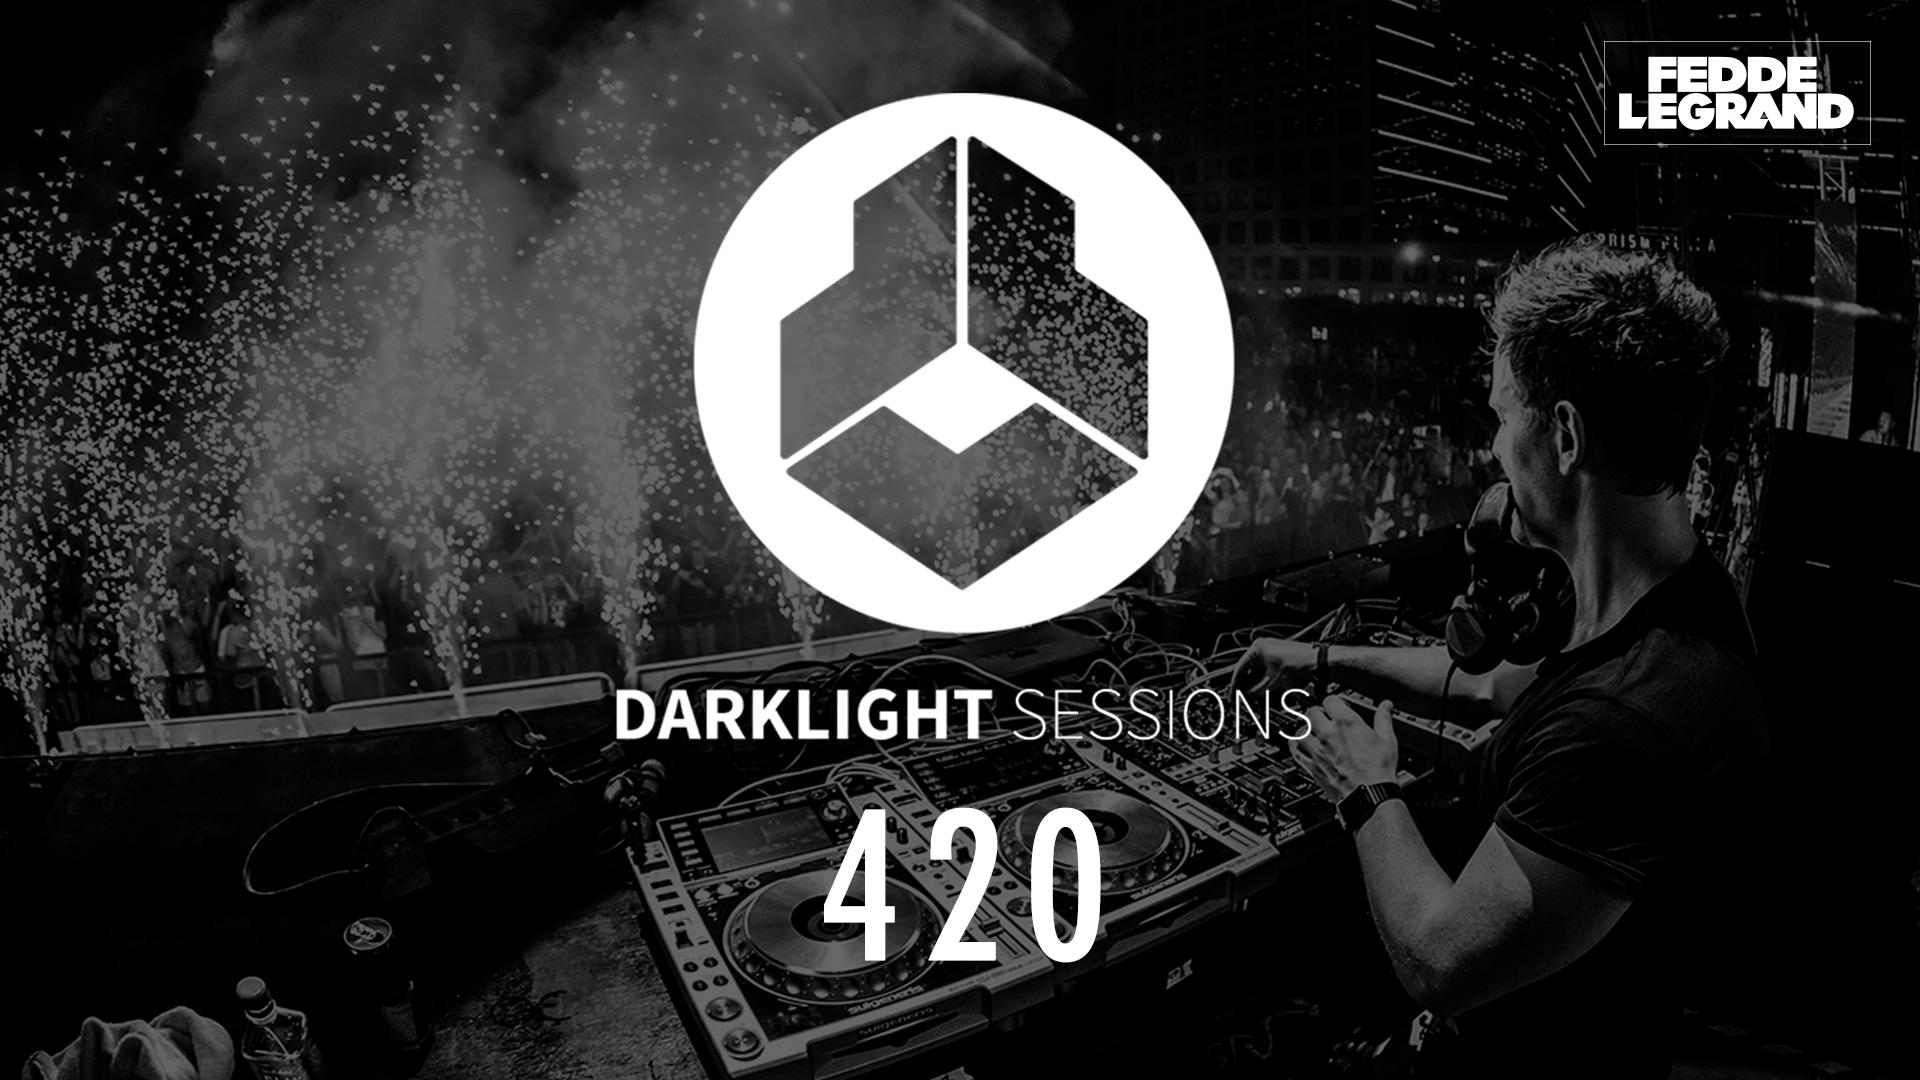 Darklight Sessions 420